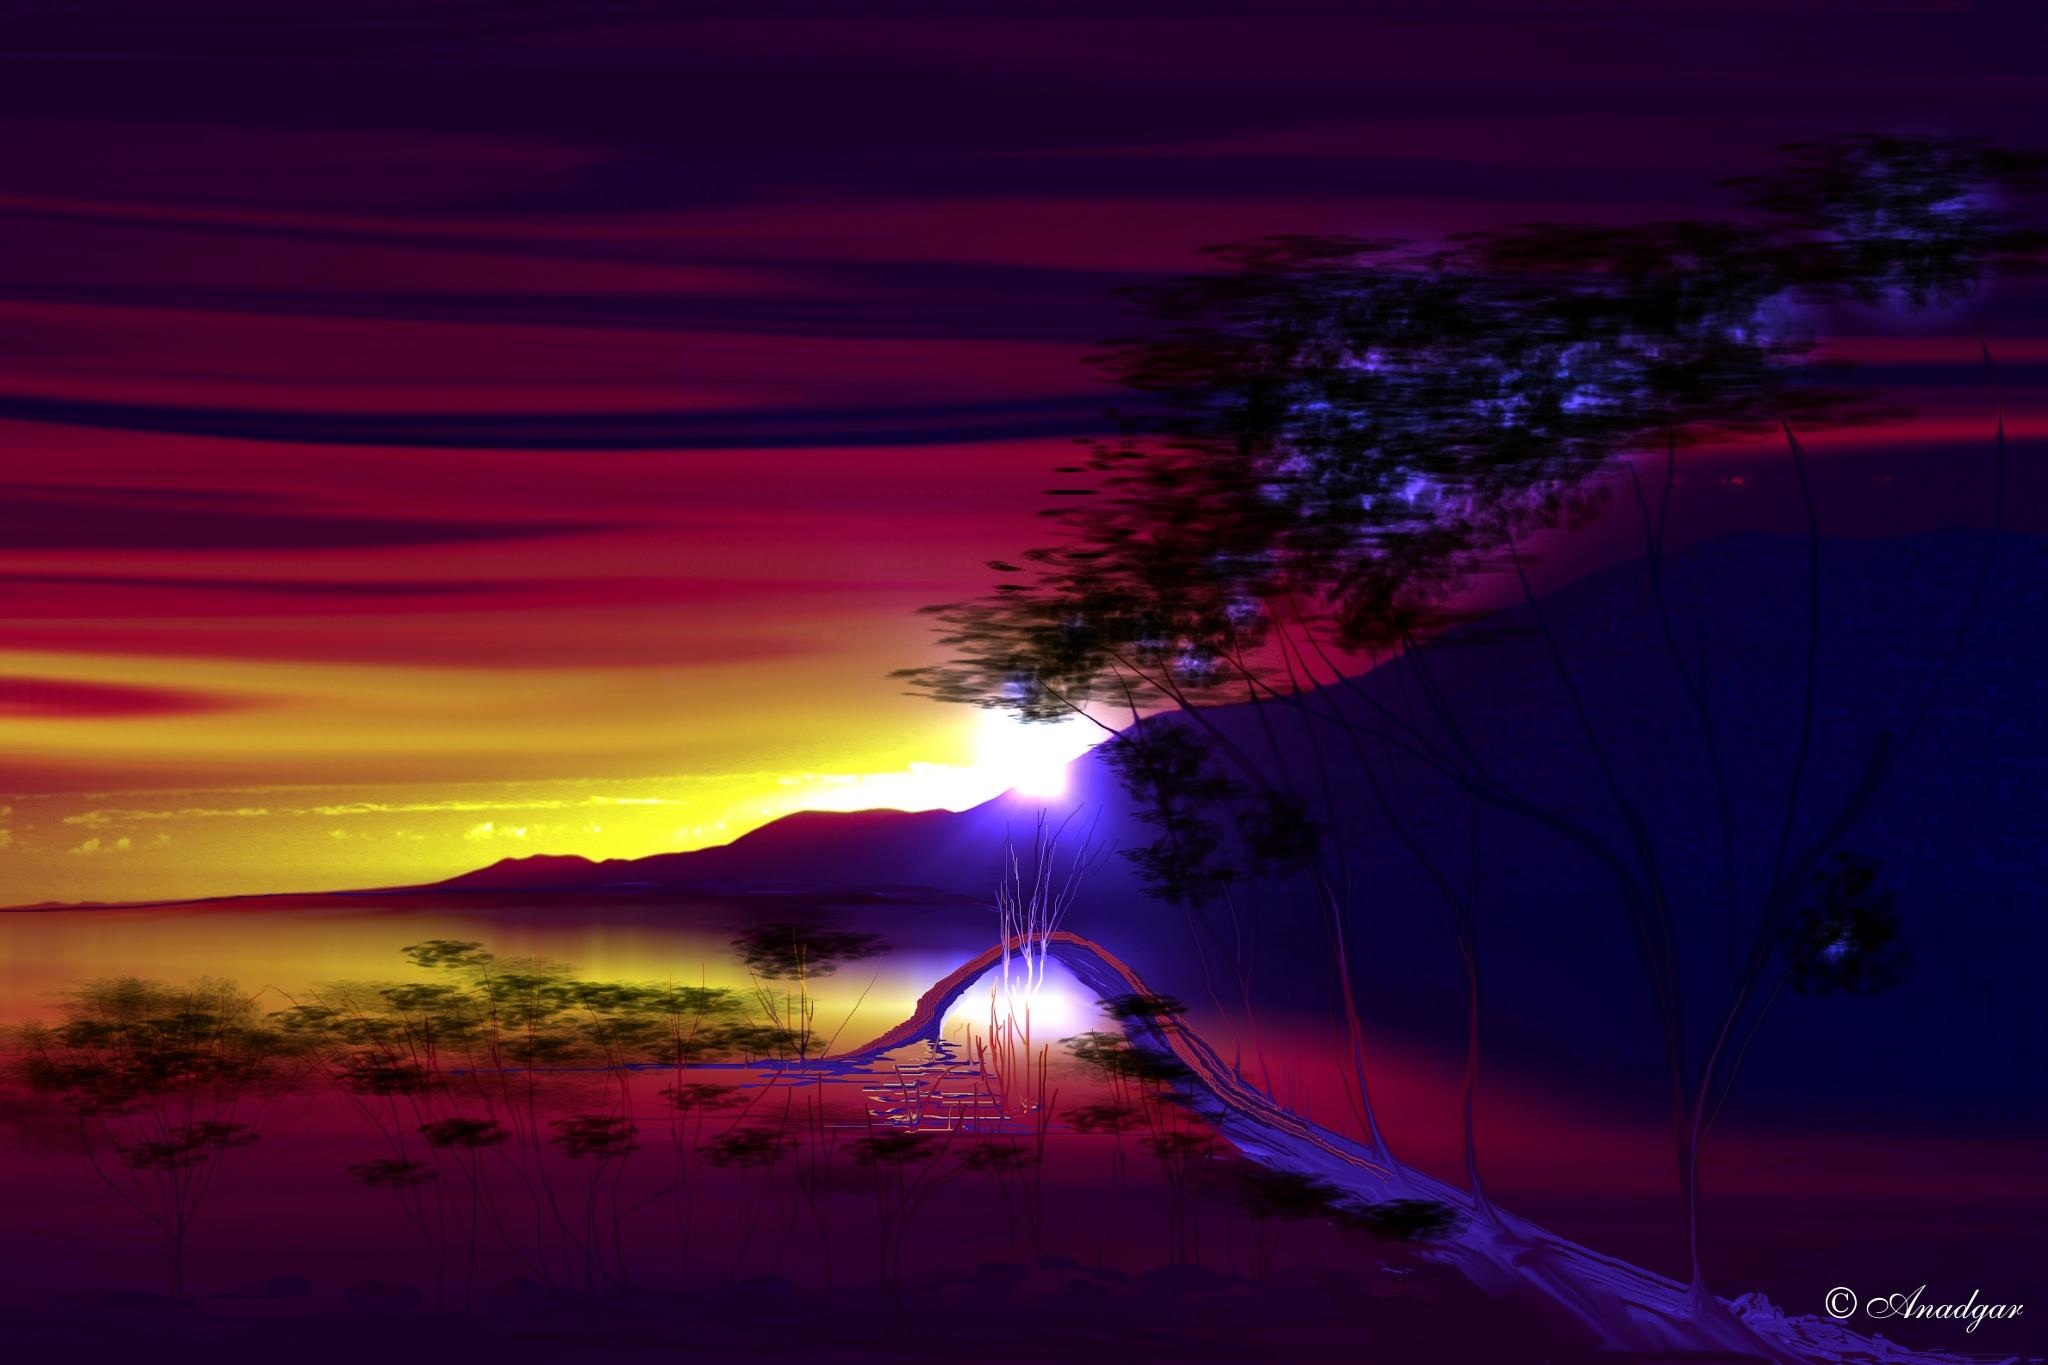 iluminado by Anadgar03